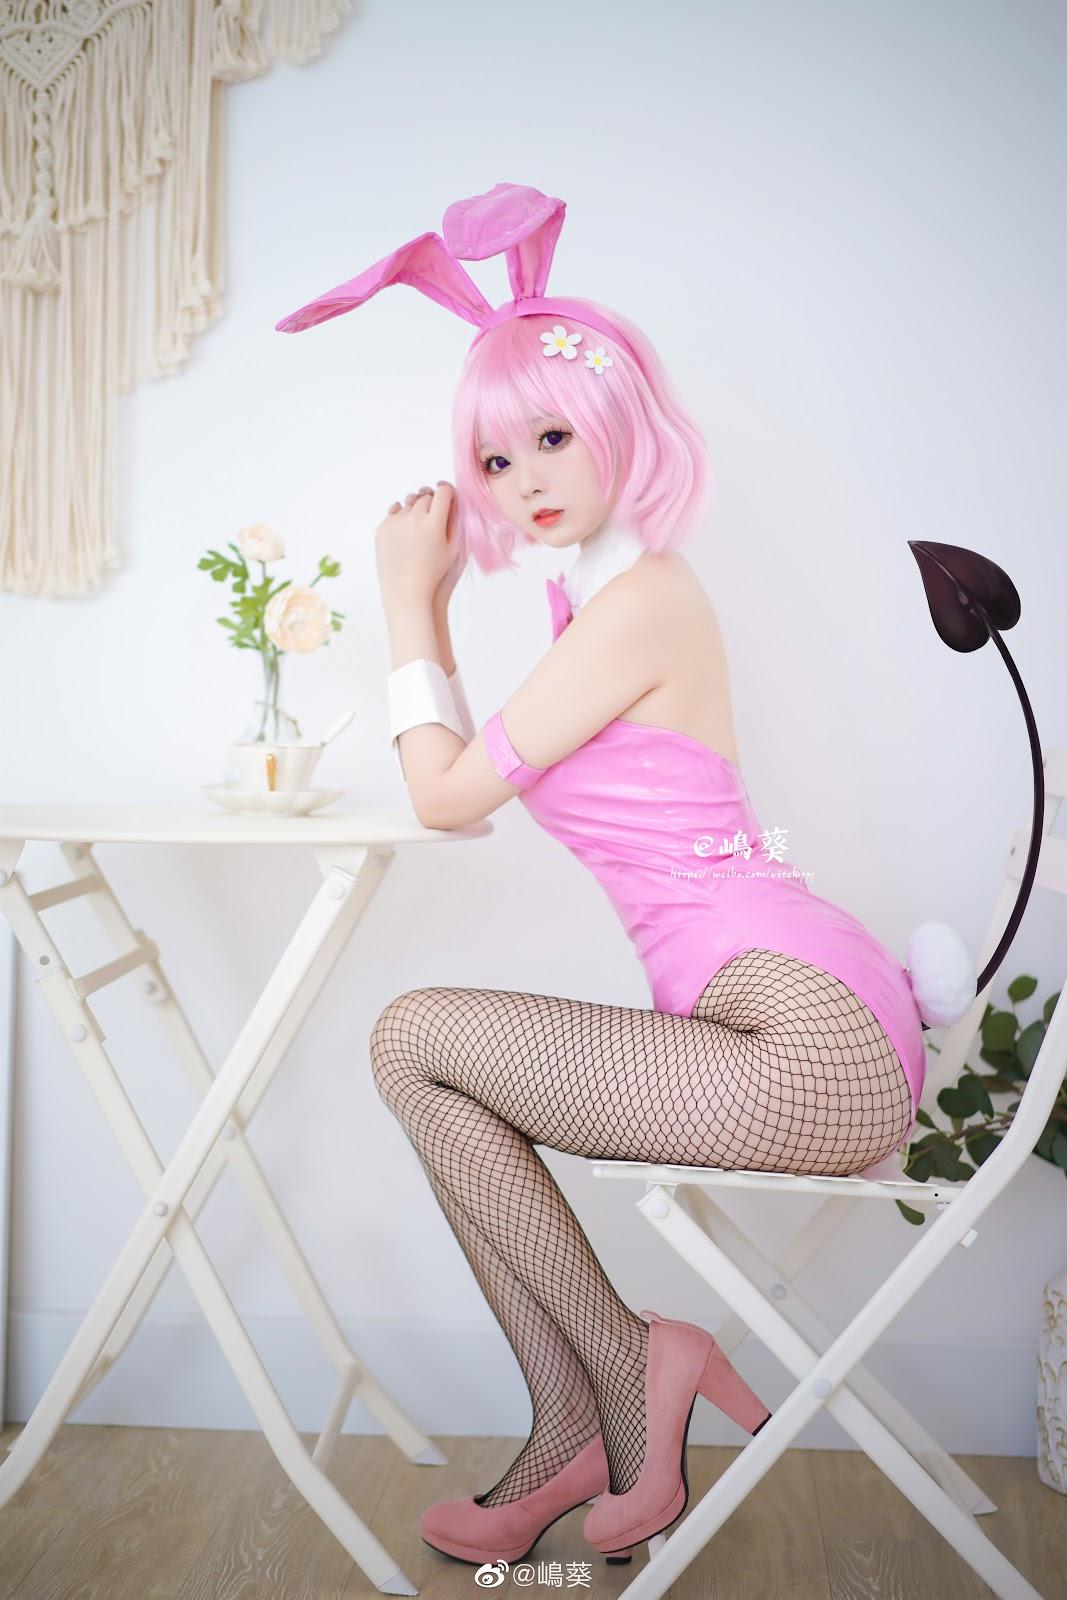 7jnek6ehwyzsxo36cf20lc1va - Cute asian girl cosplay pink devil hottes 2019